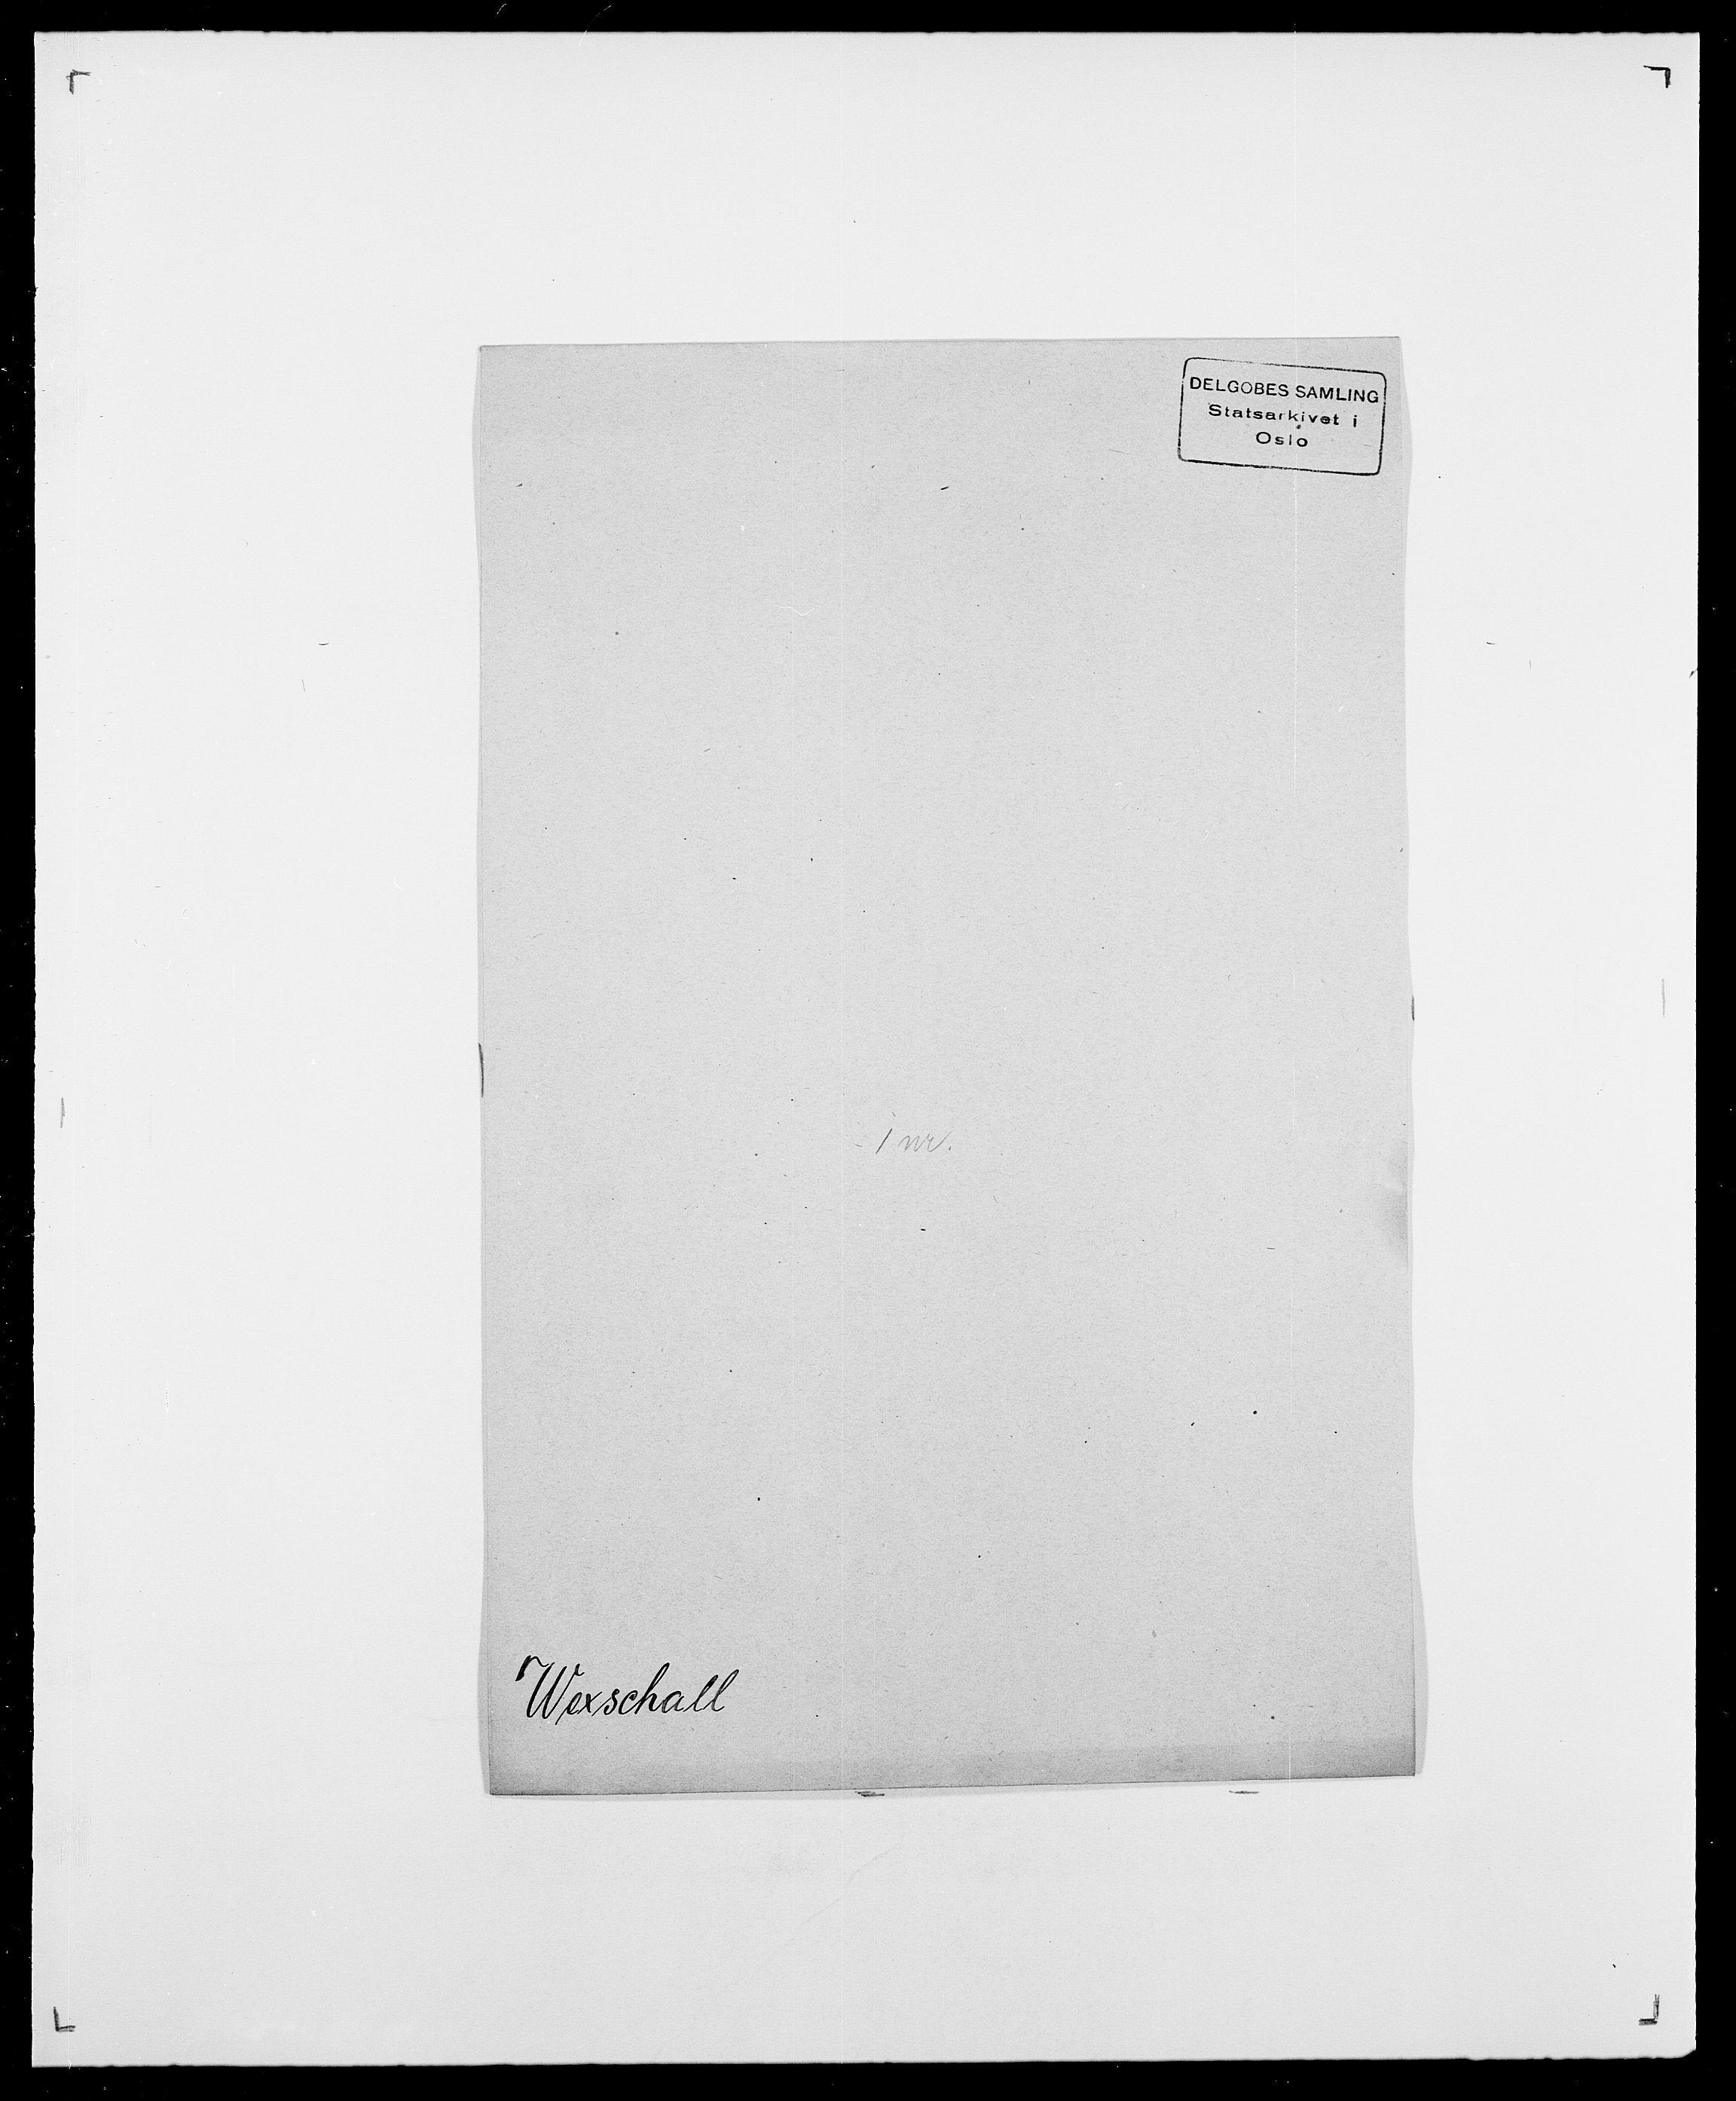 SAO, Delgobe, Charles Antoine - samling, D/Da/L0041: Vemmestad - Viker, s. 358